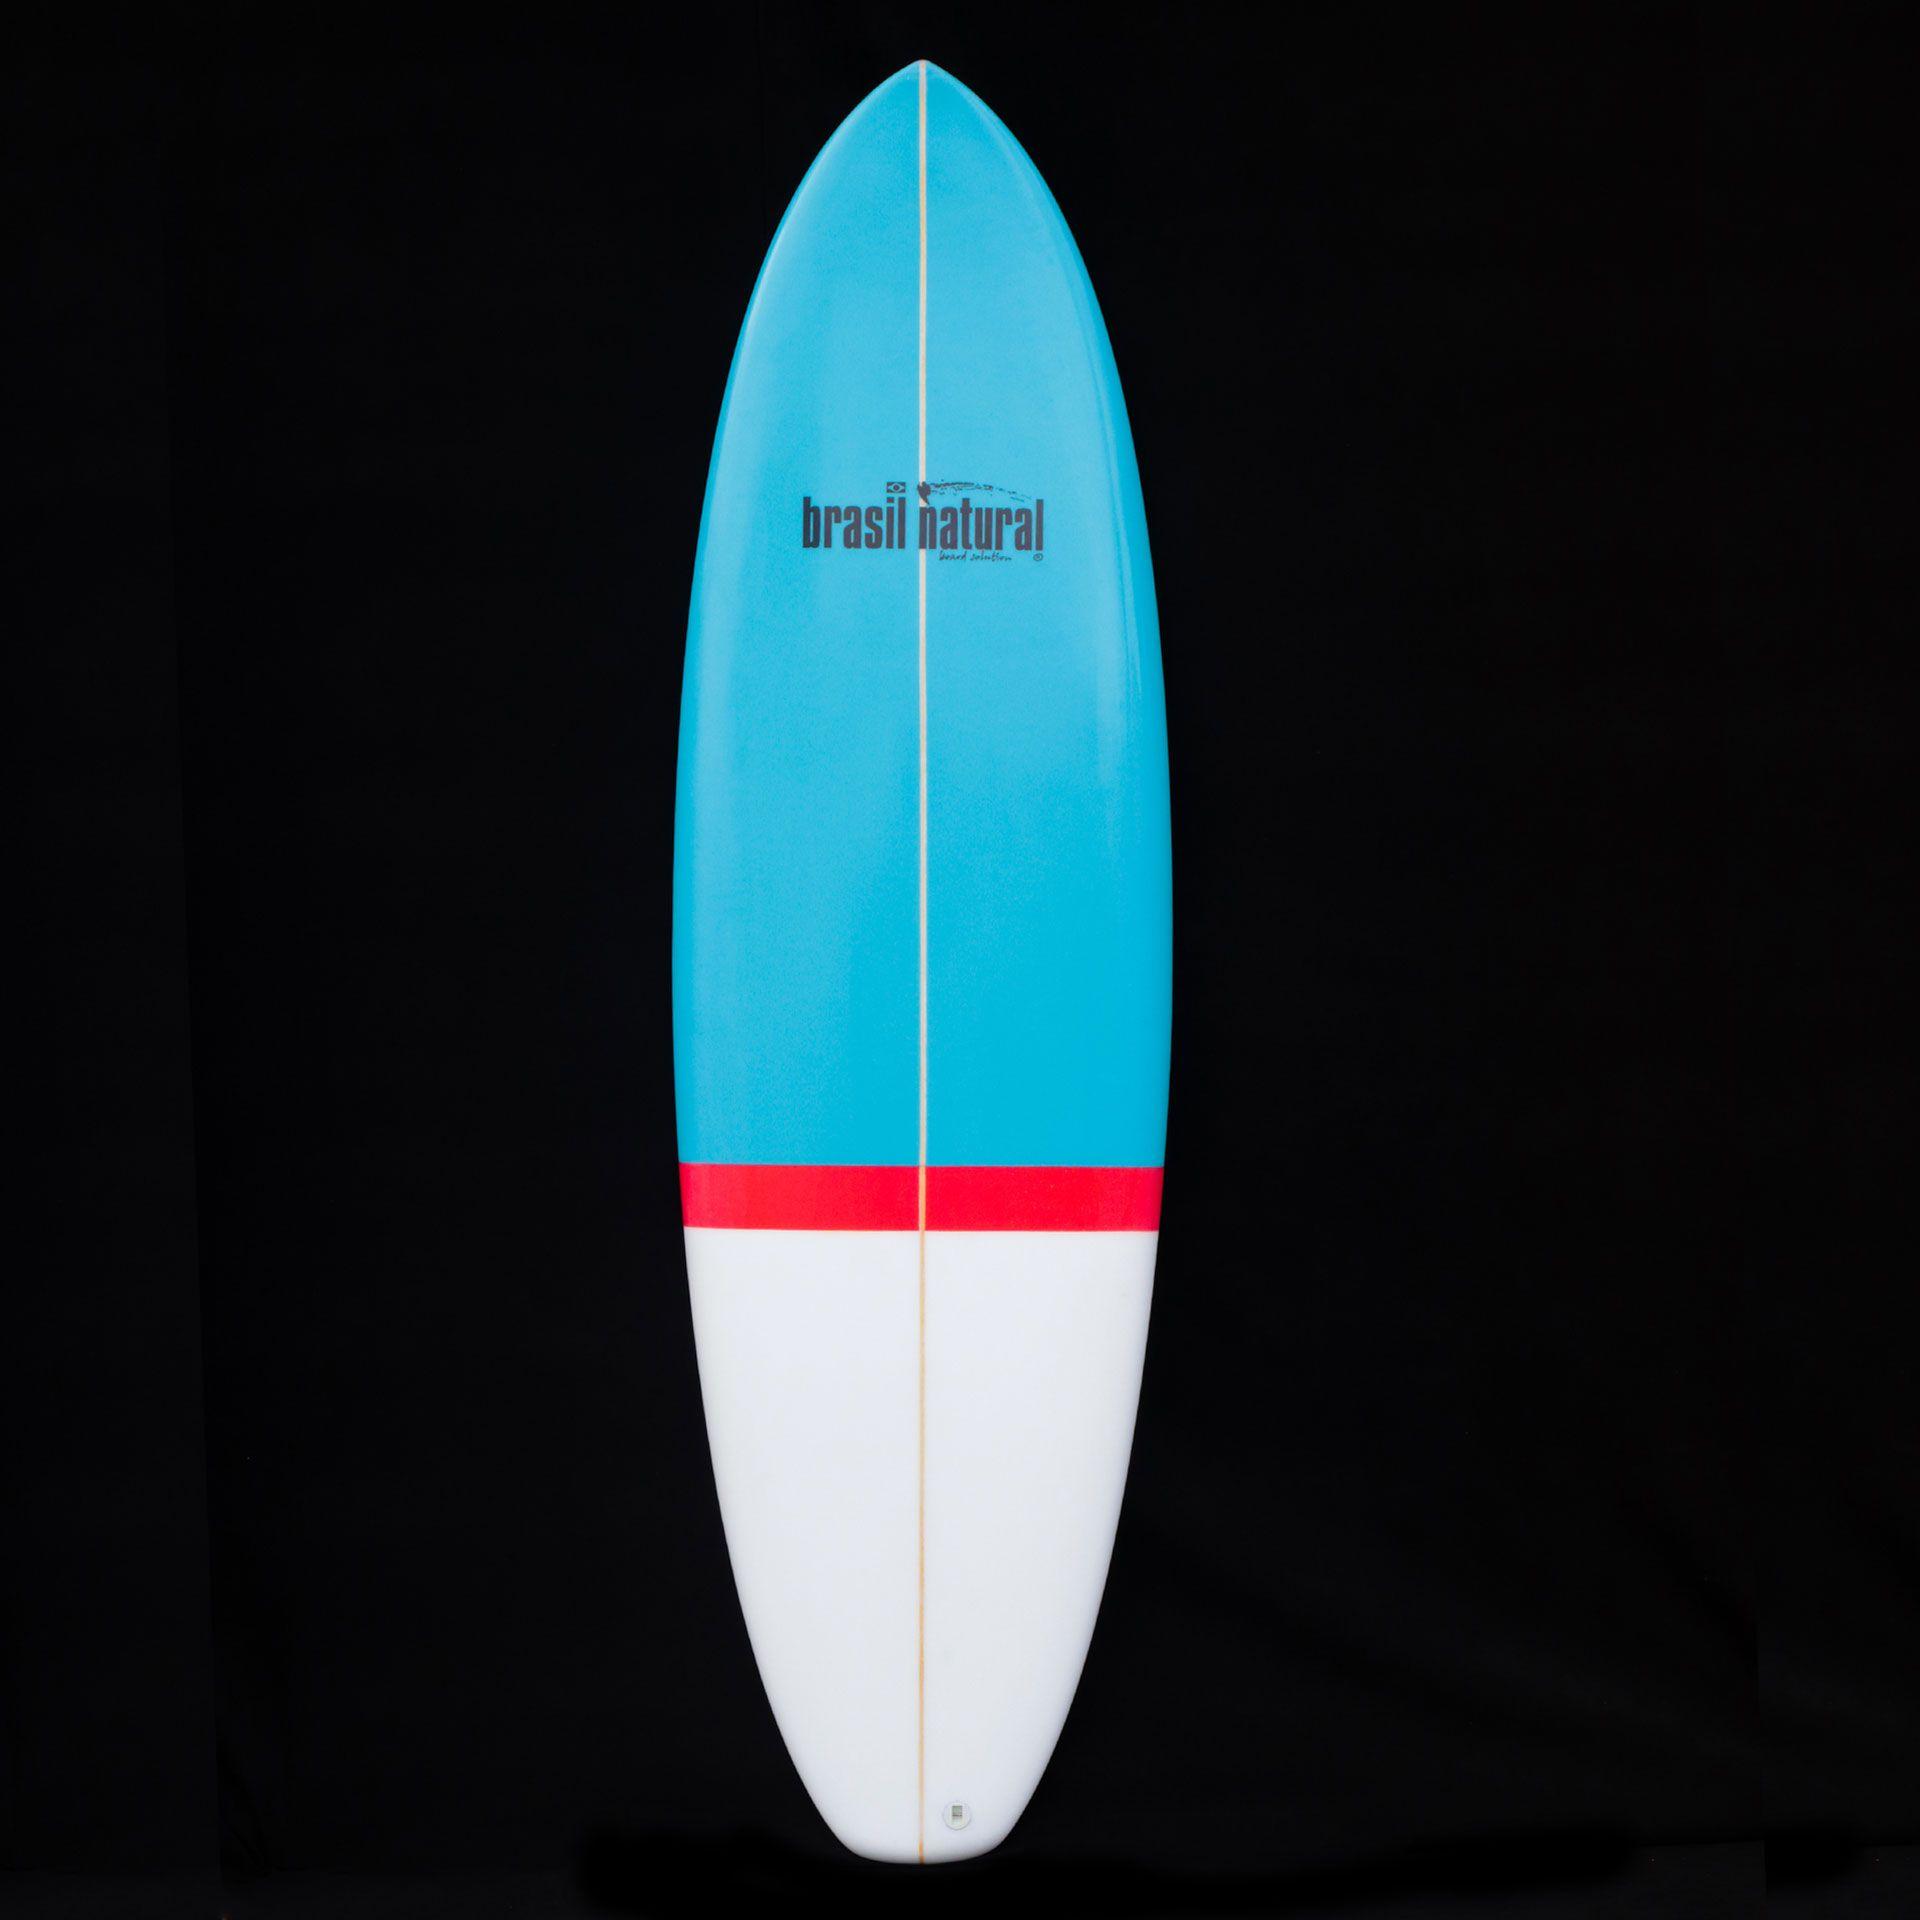 Prancha de surf fibra 5.8 Brasil Natural